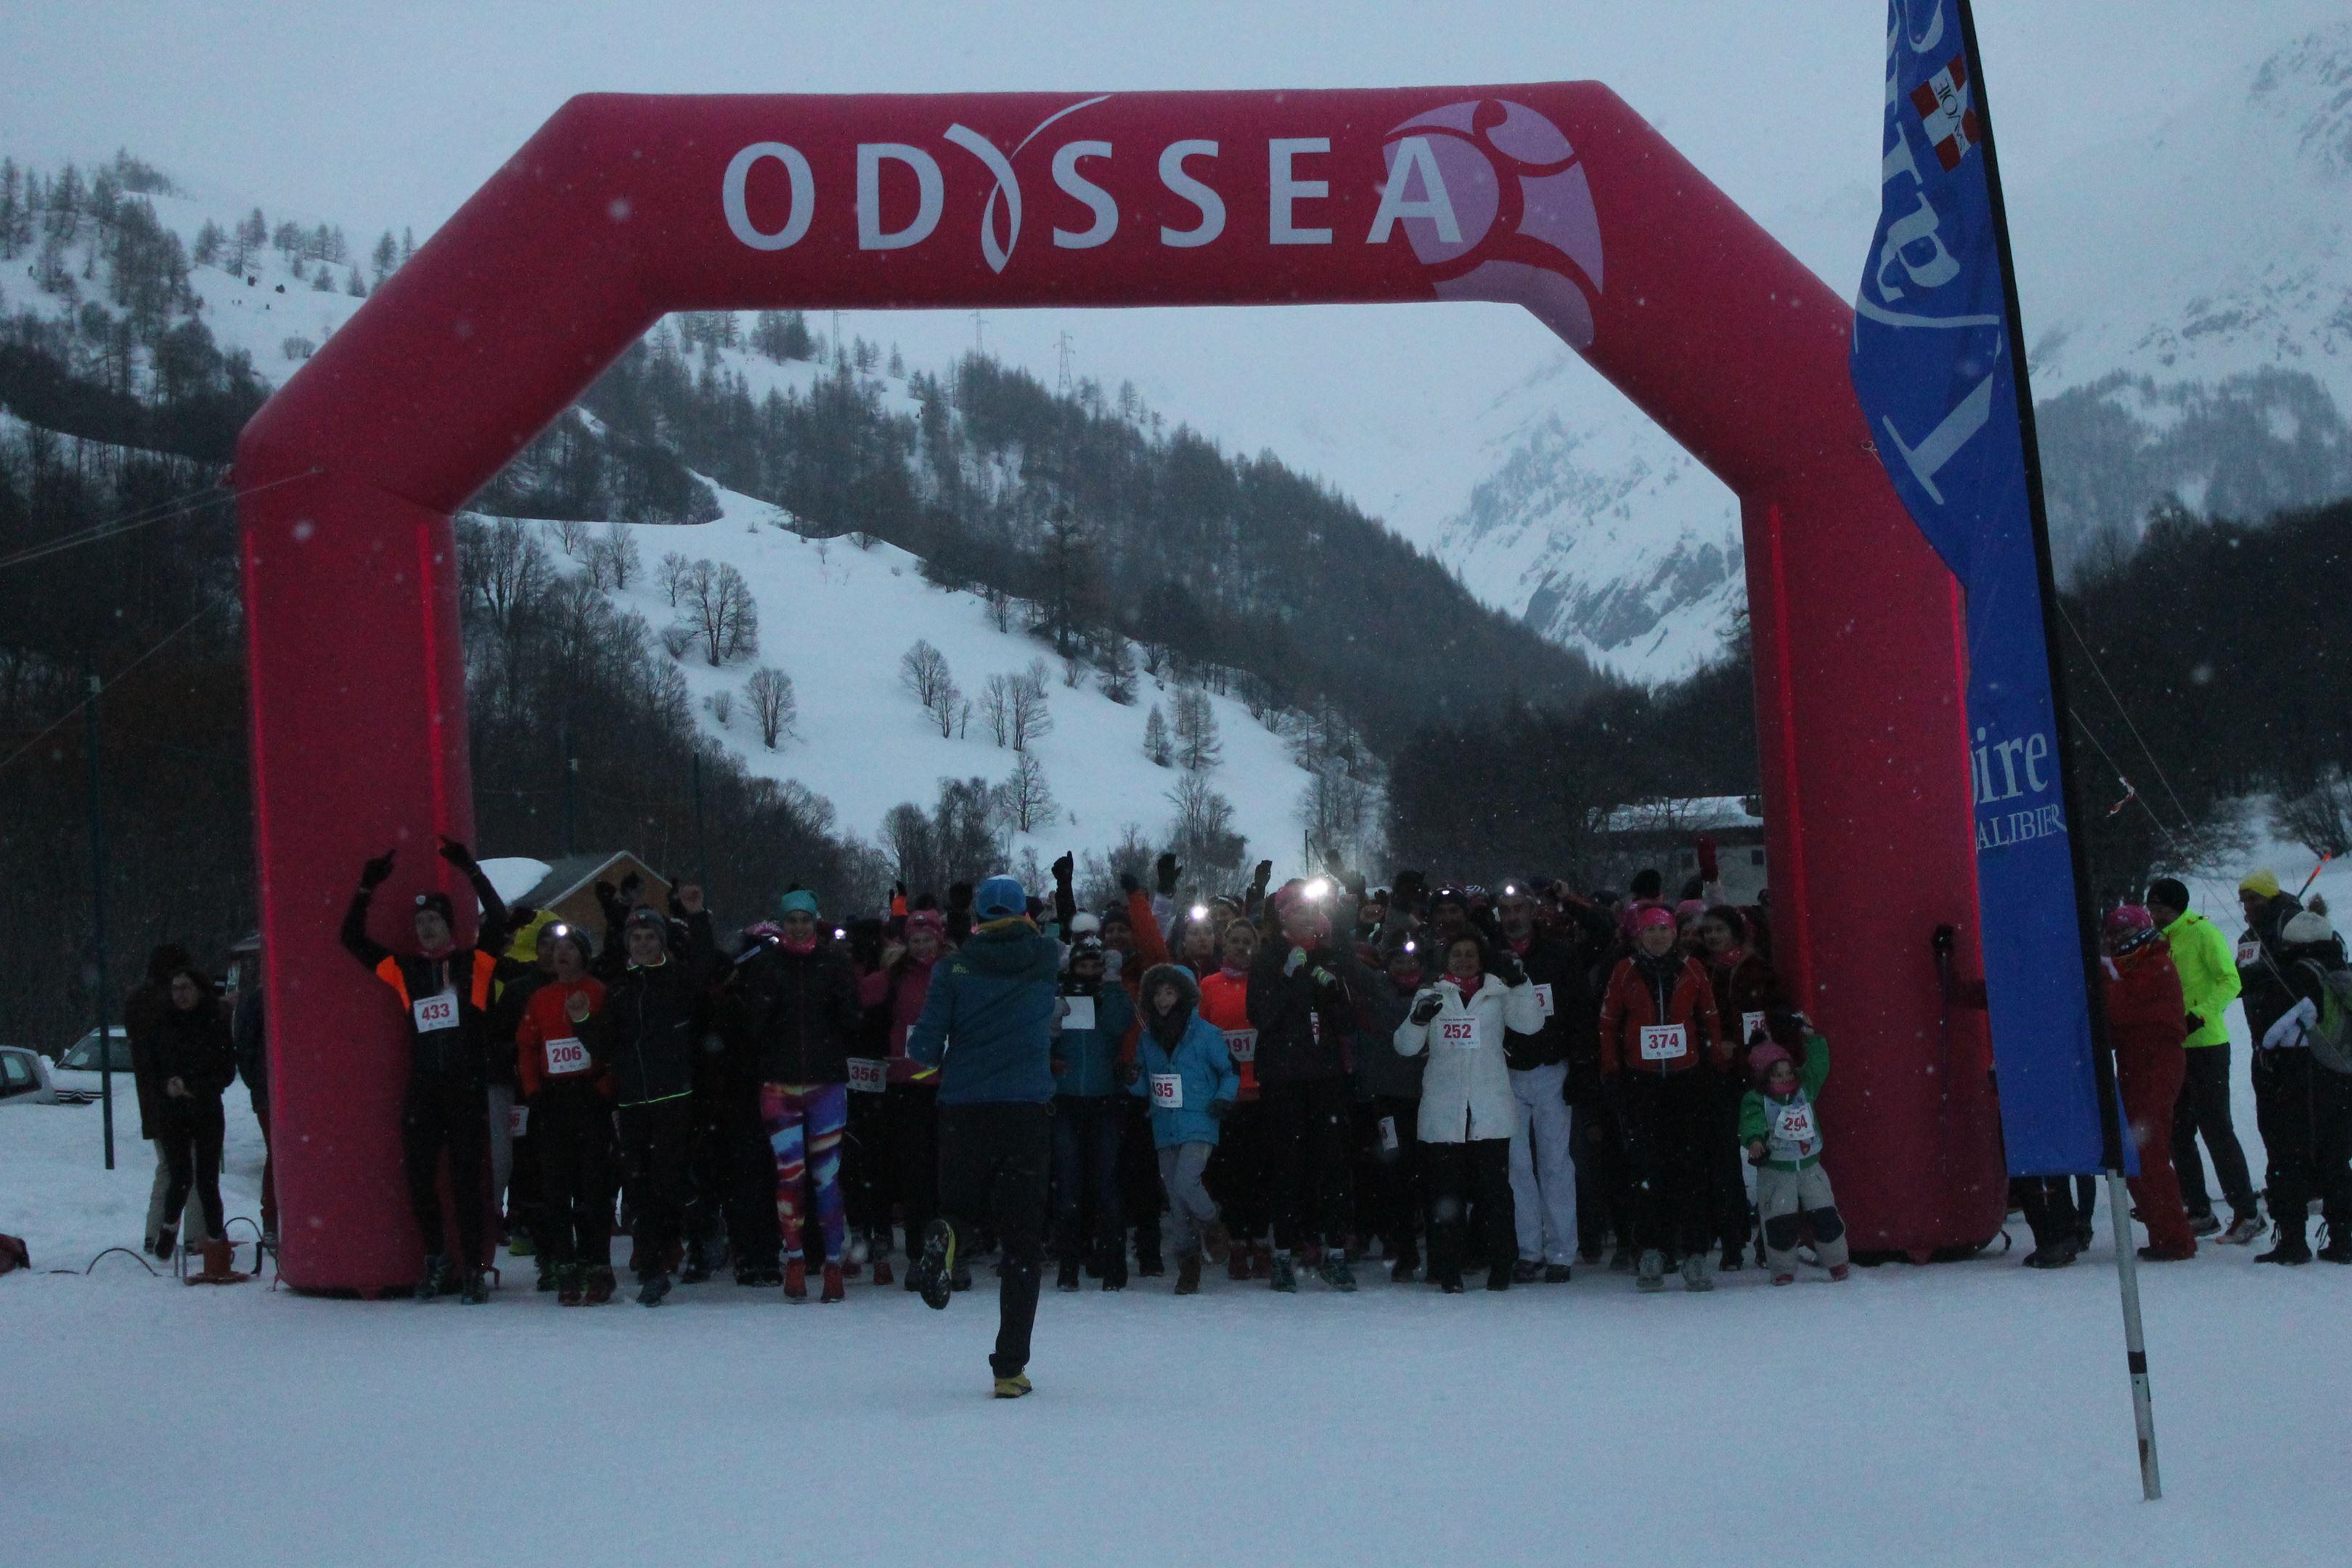 odyssea départ 5km odyssea - RESULTATS ET PHOTOS D'ODYSSEA VALLOIRE 20-02-2018